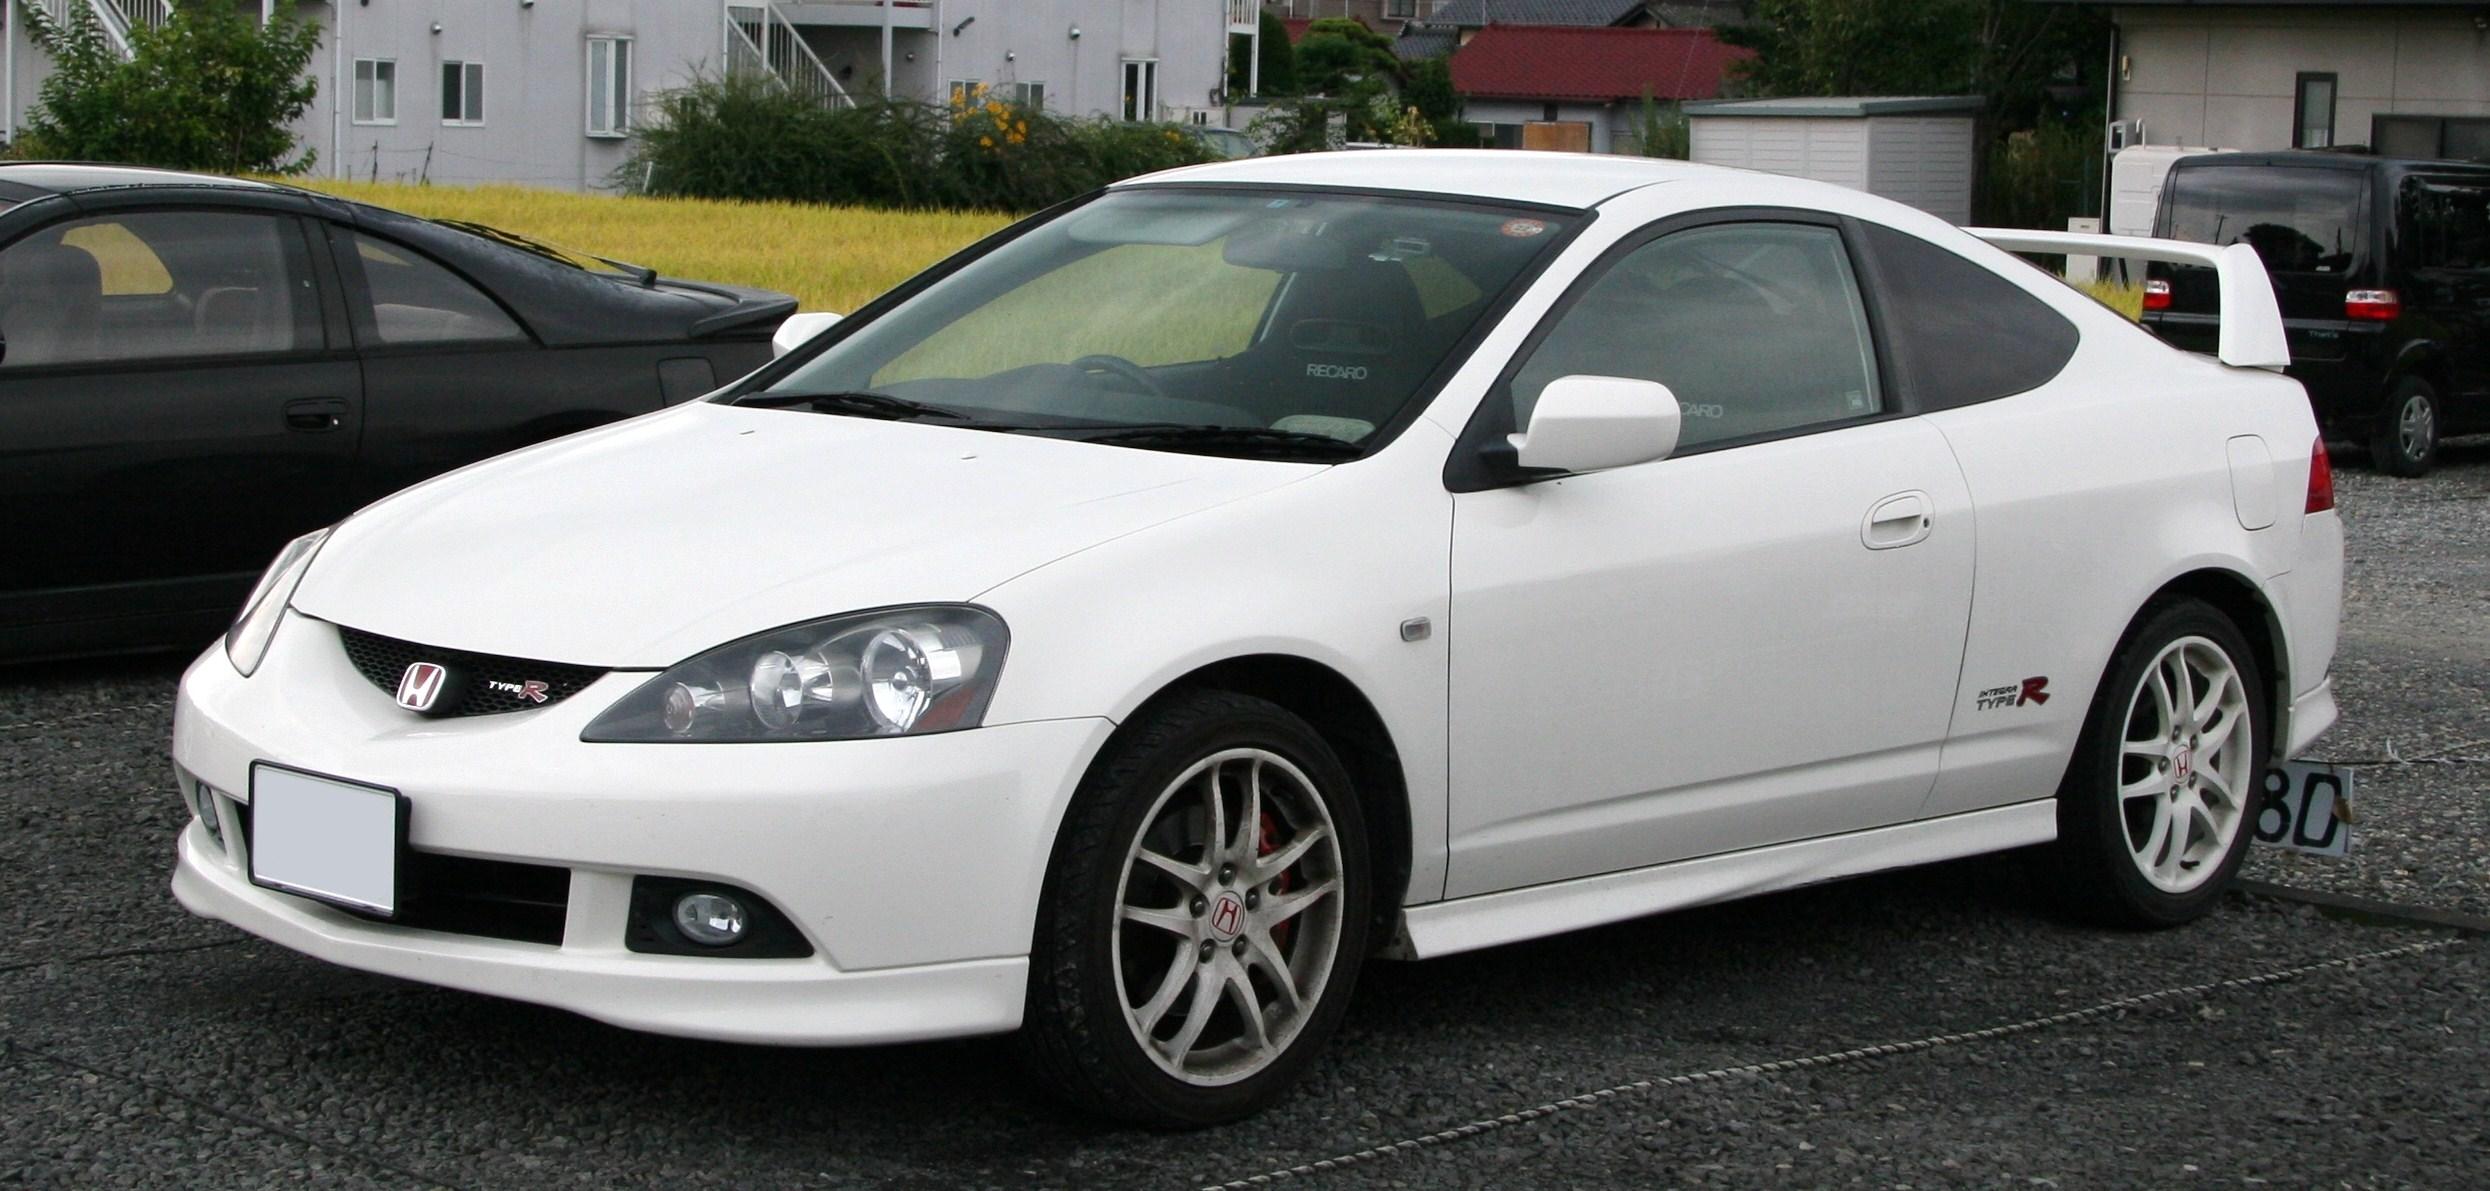 2006 Honda Civic Coupe For Sale File:Honda Integra Type-R DC5.jpg - Wikimedia Commons